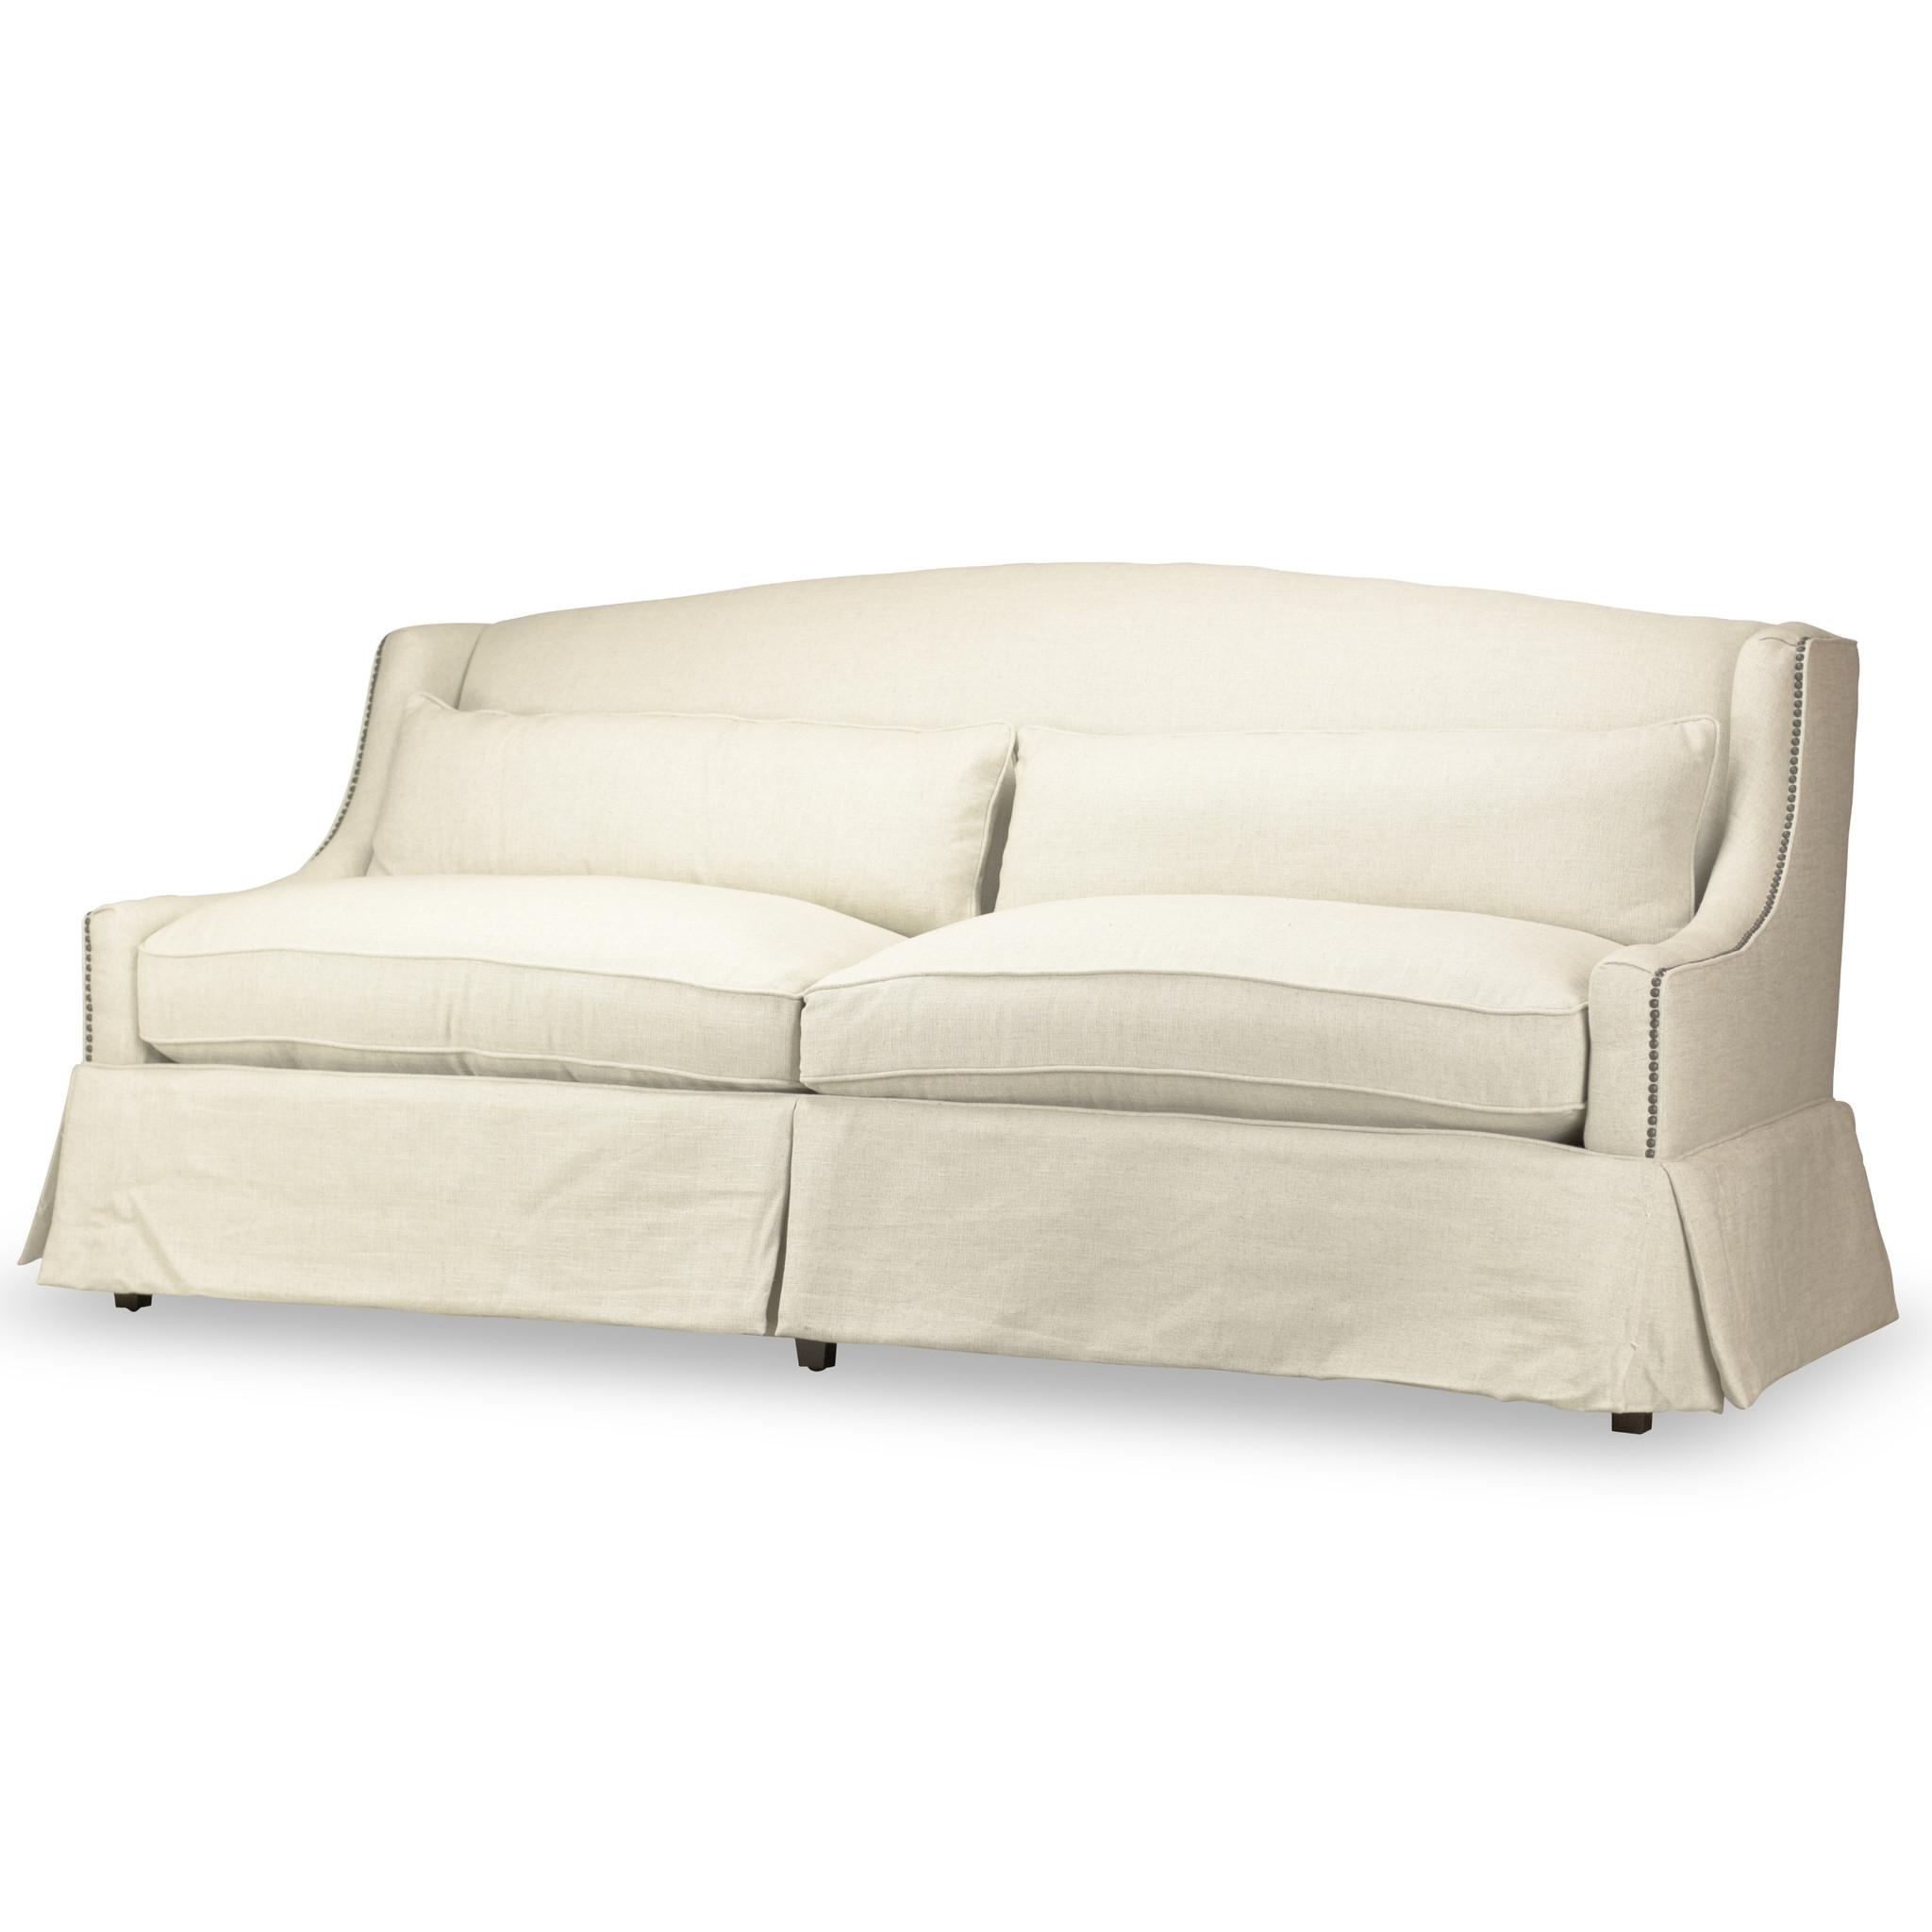 halston-89-sofa-3385-99-Nat-f3q